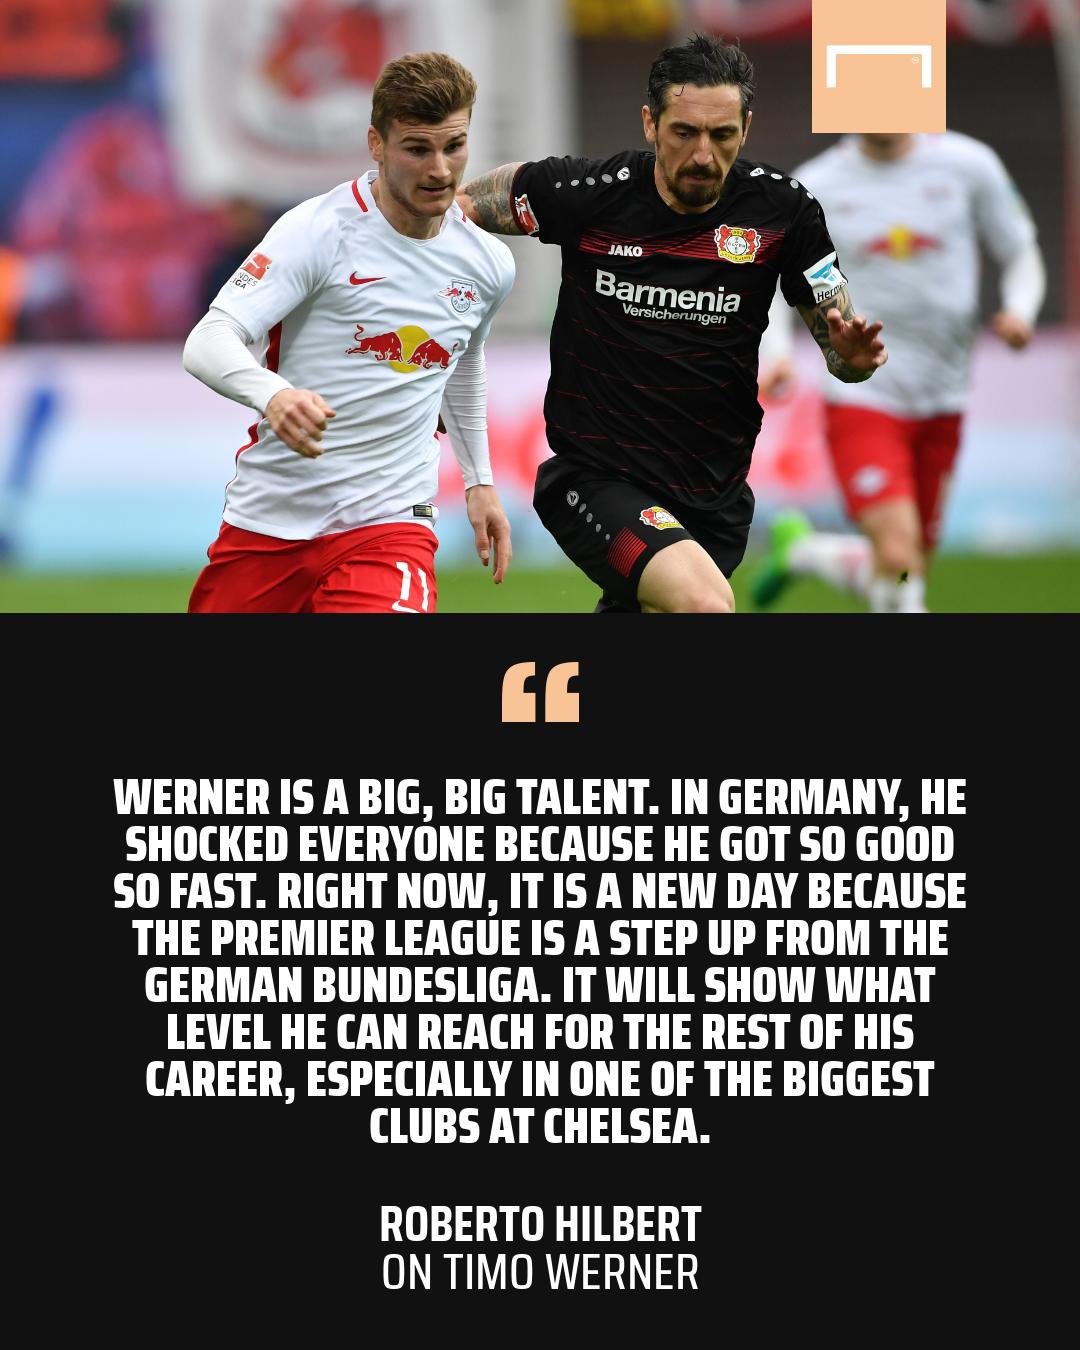 'Part Ozil and part Ballack' Havertz can win Premier League for Chelsea, says Hilbert